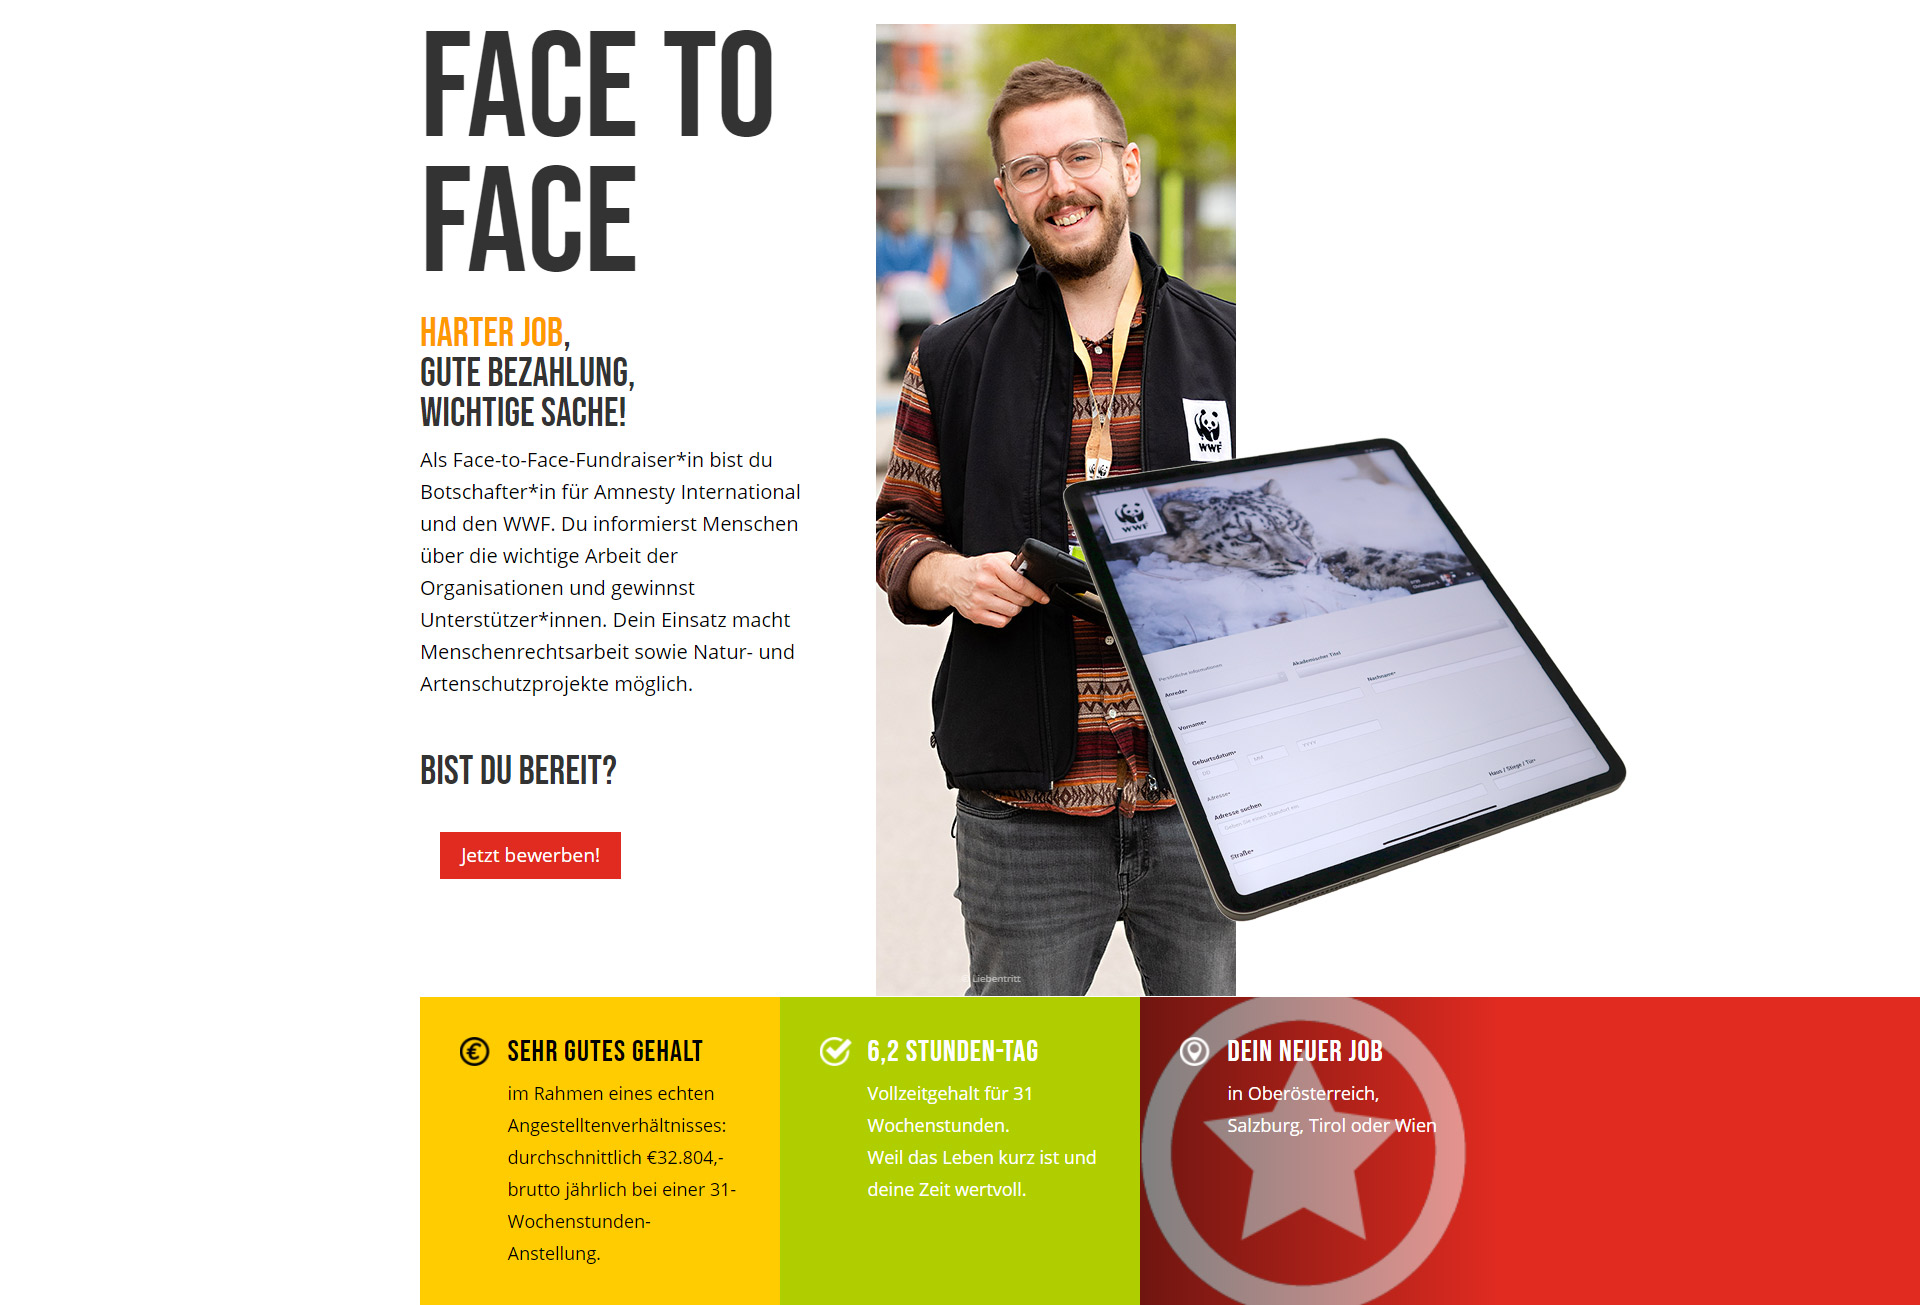 relaunch-aiwwf-iservice-agentur-wien-website-face-to-face